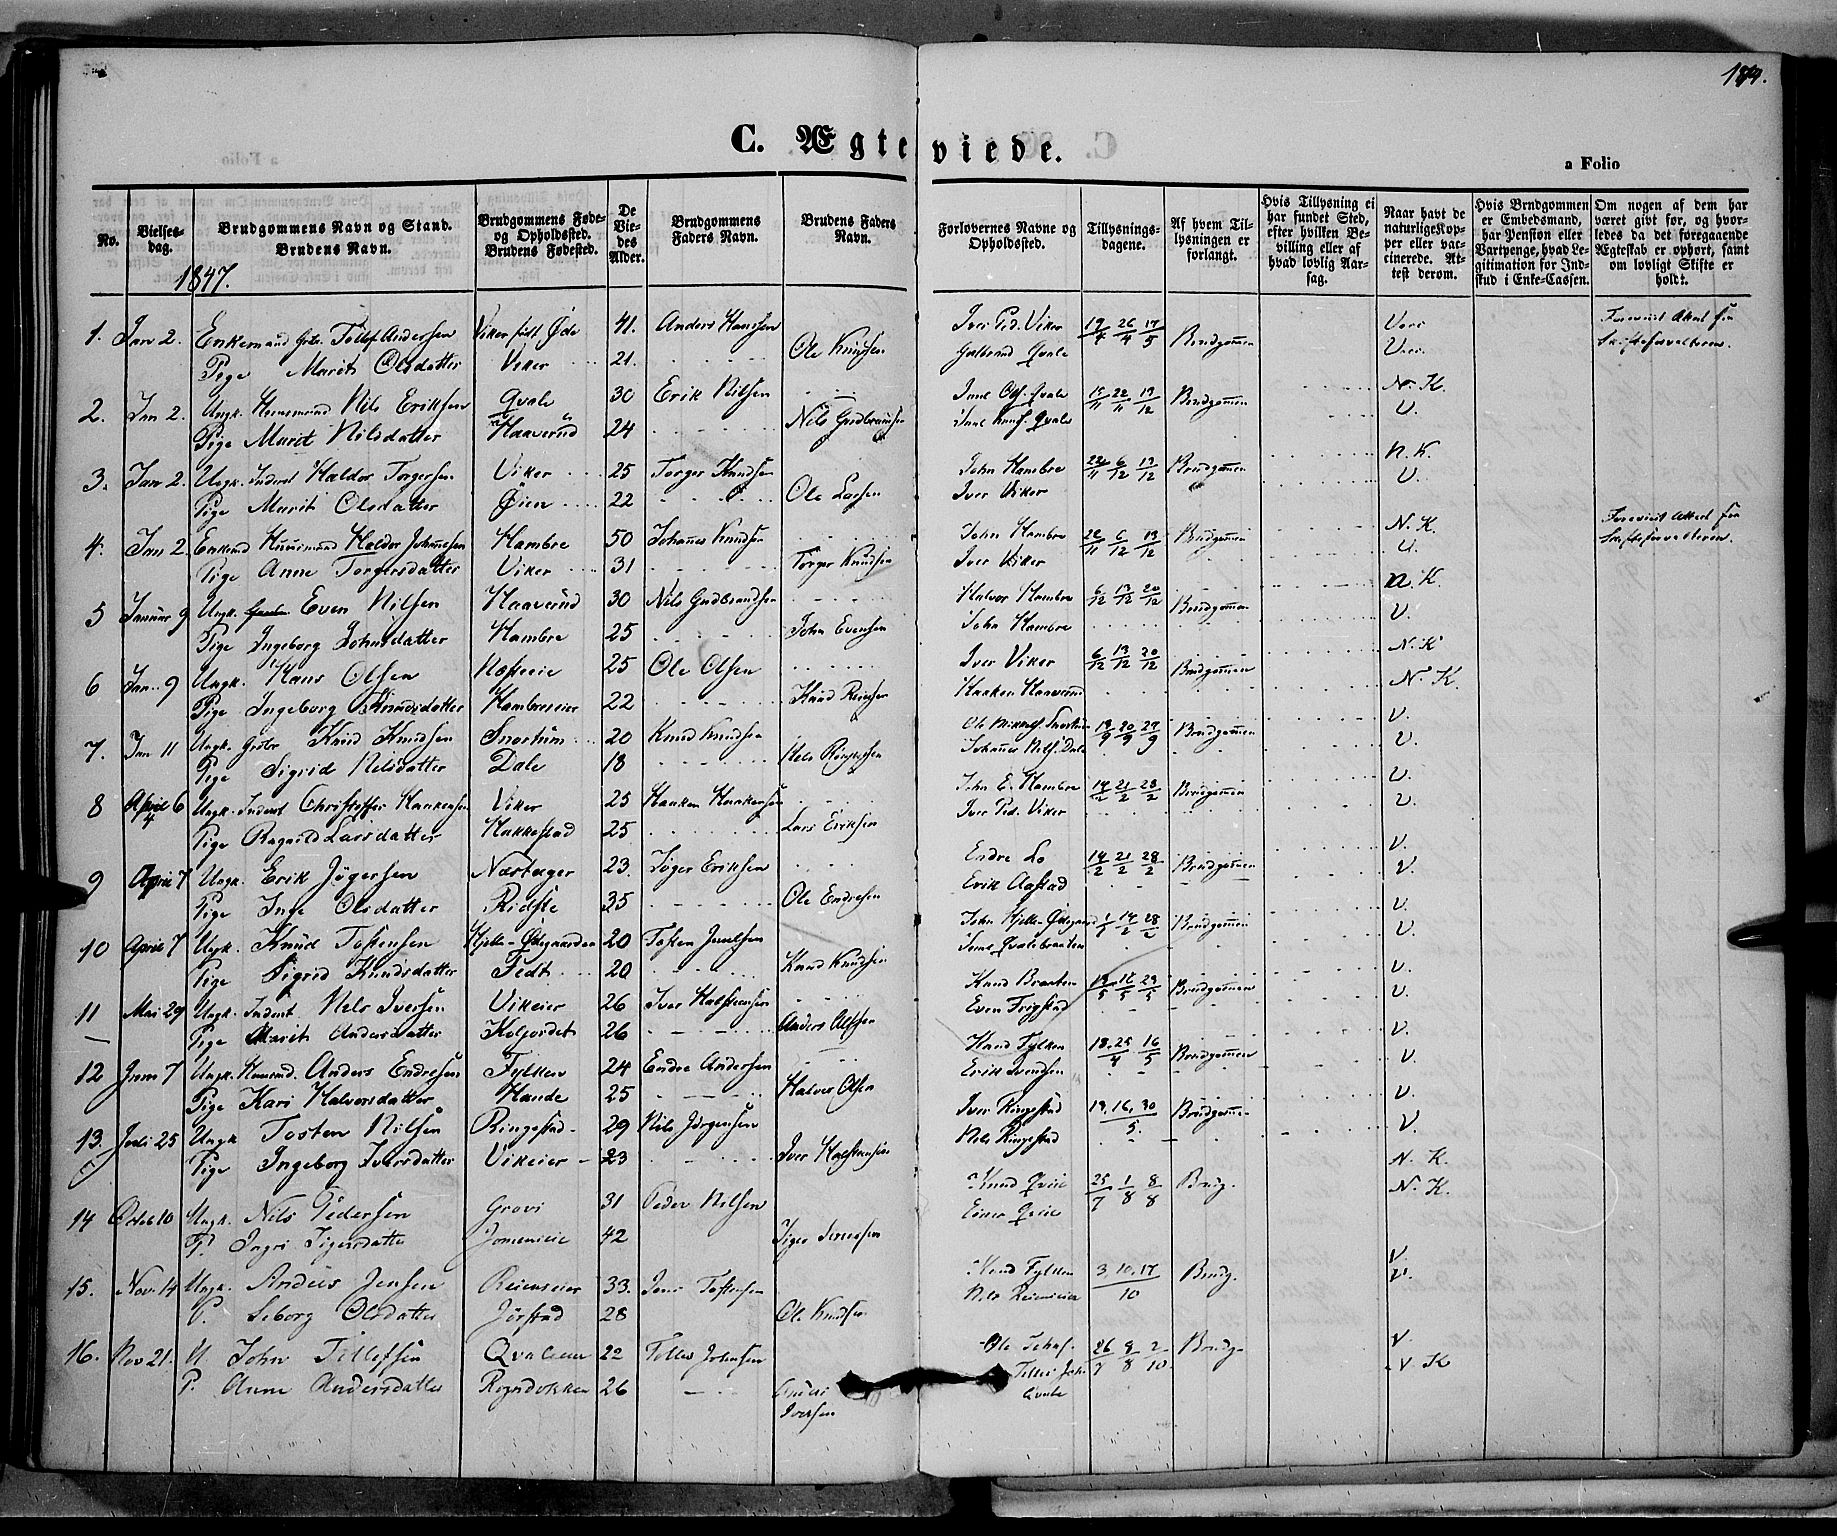 SAH, Vestre Slidre prestekontor, Ministerialbok nr. 1, 1844-1855, s. 174